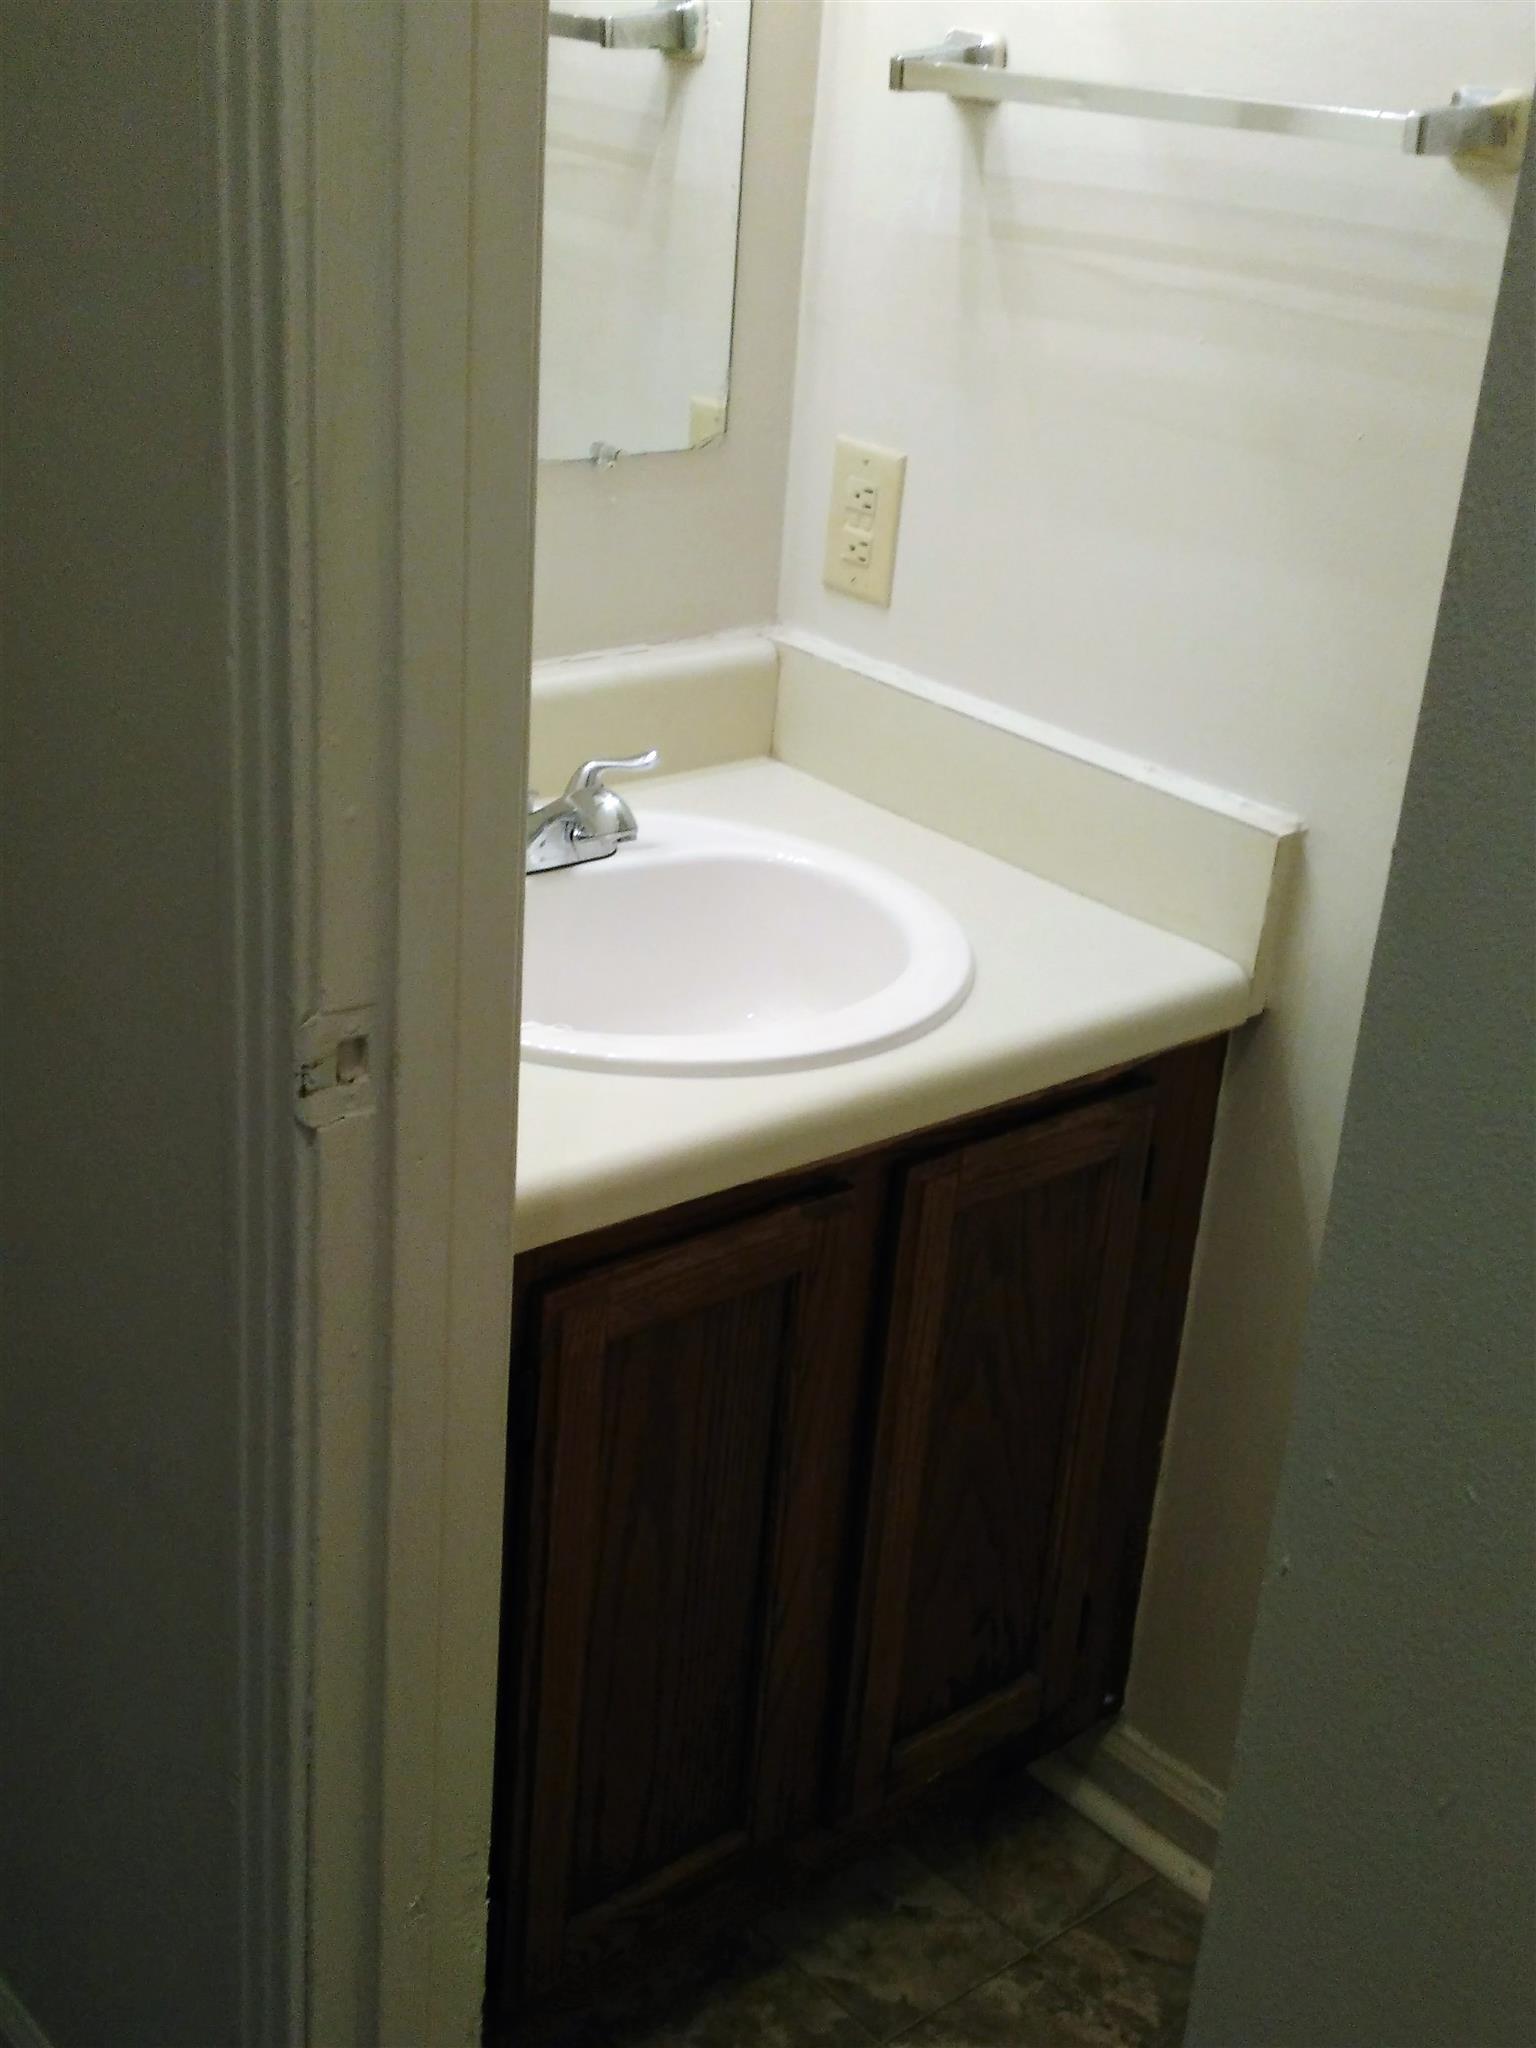 Bathroom Sinks Nashville Tn 614 castlegate dr, nashville, tn 37217 mls# 1814895 - movoto